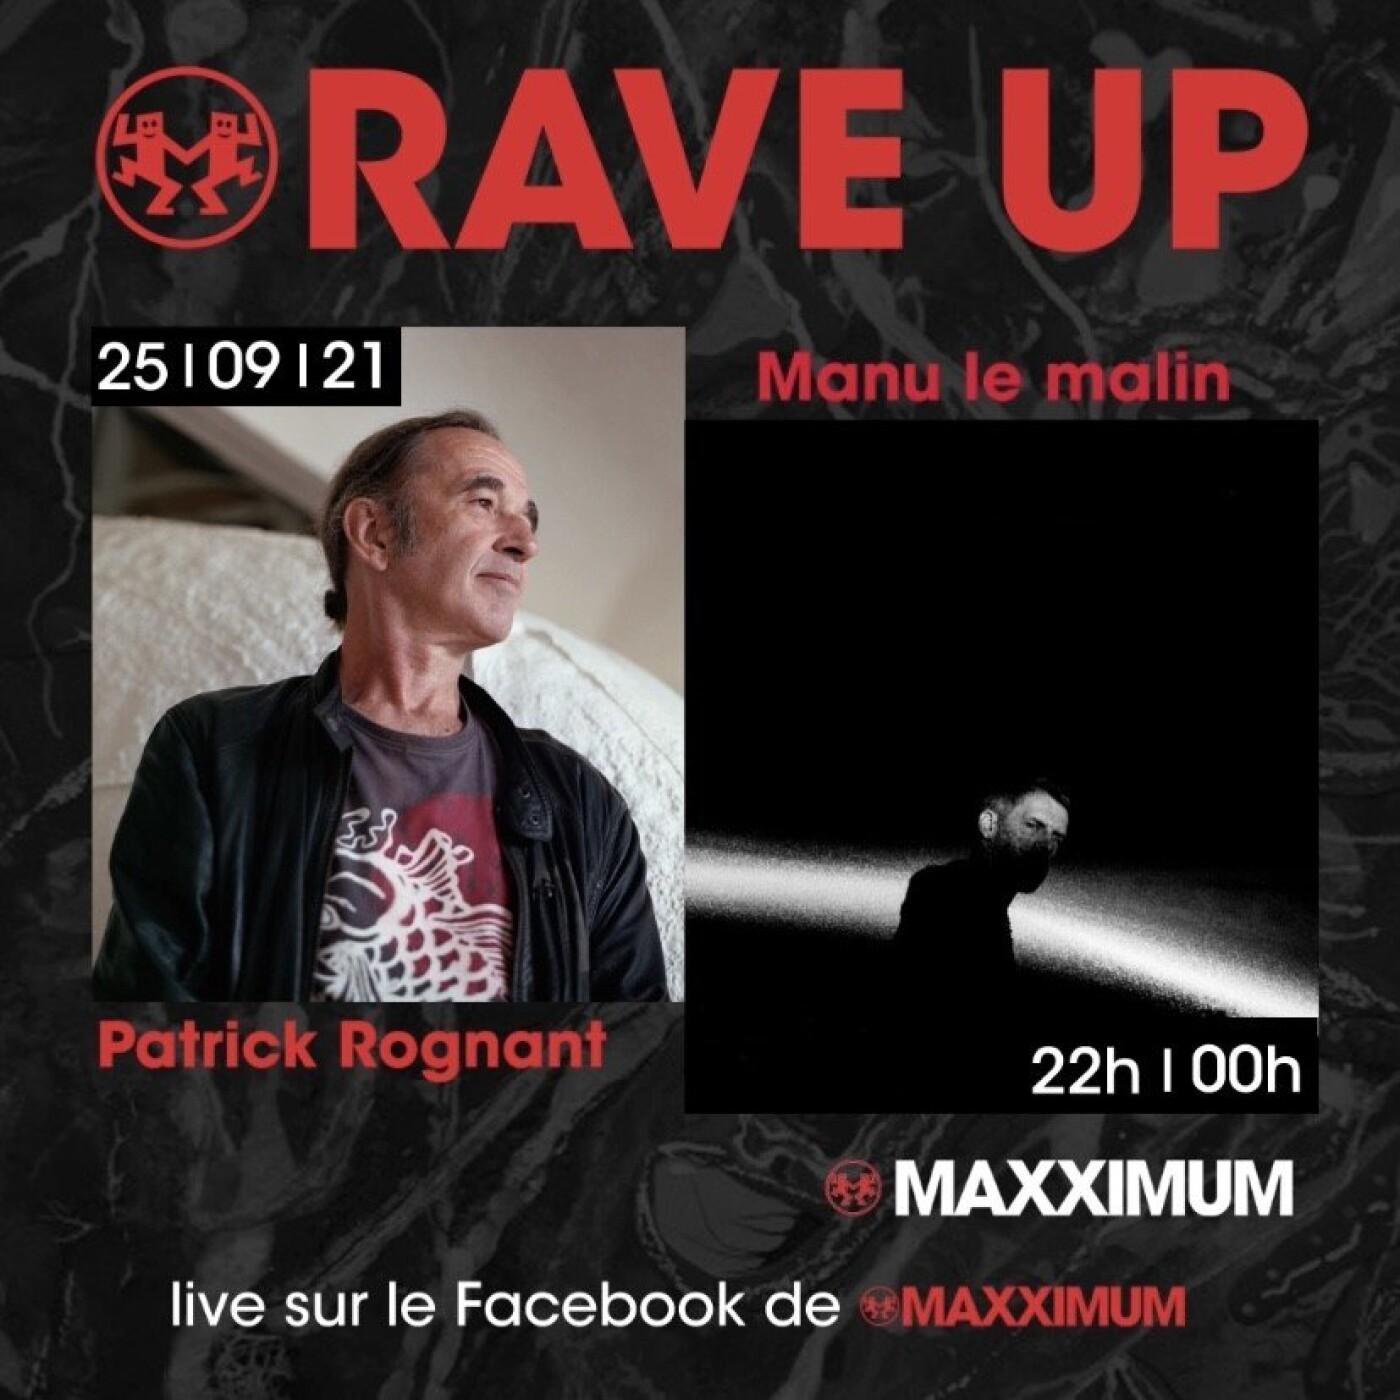 RAVE UP : MANU LE MALIN